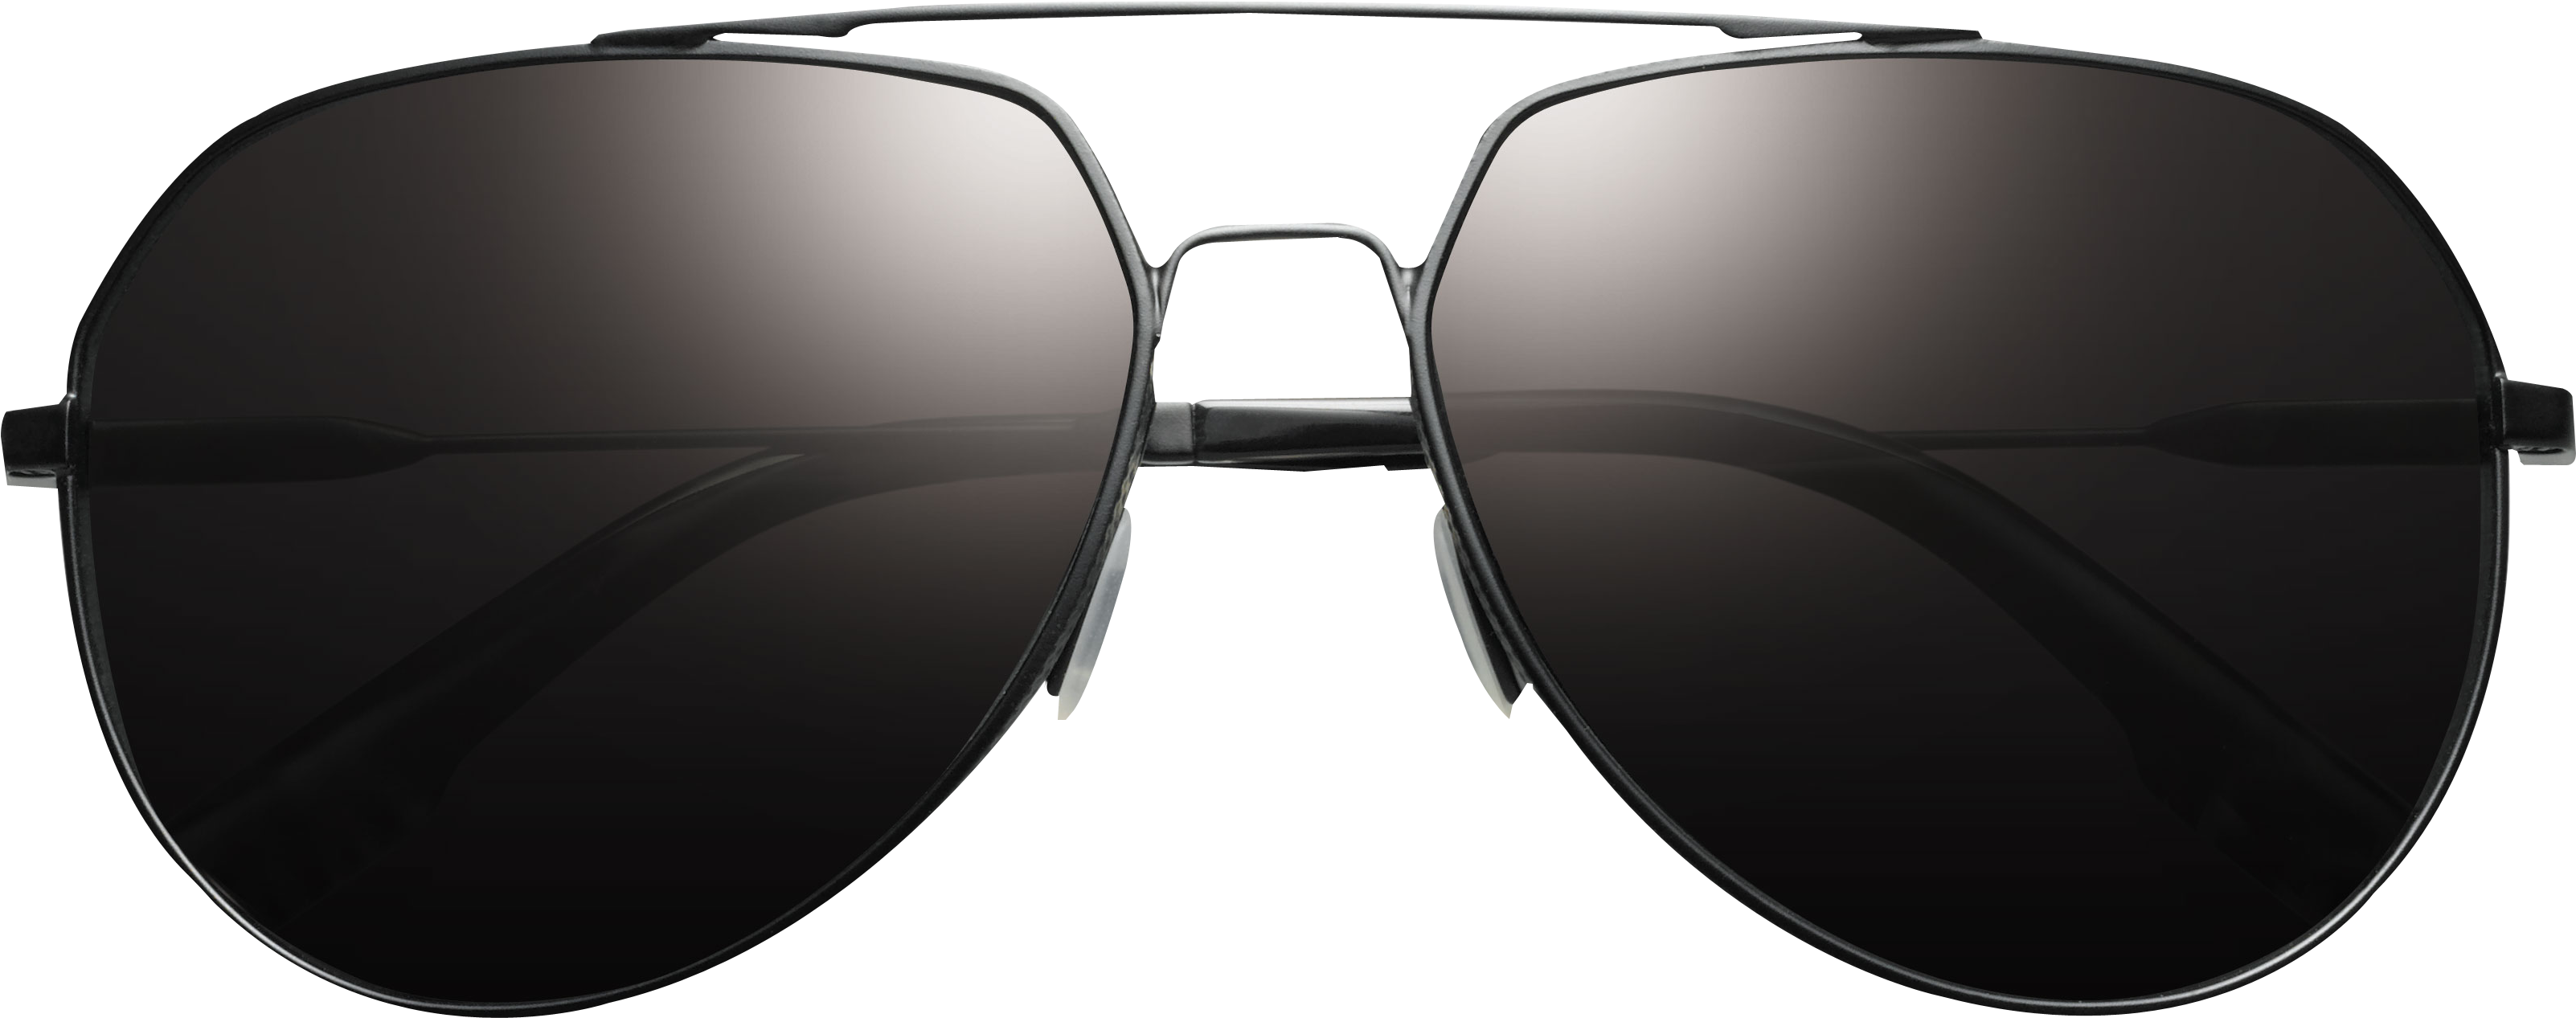 HD Aviator Sunglasses Clip Art.